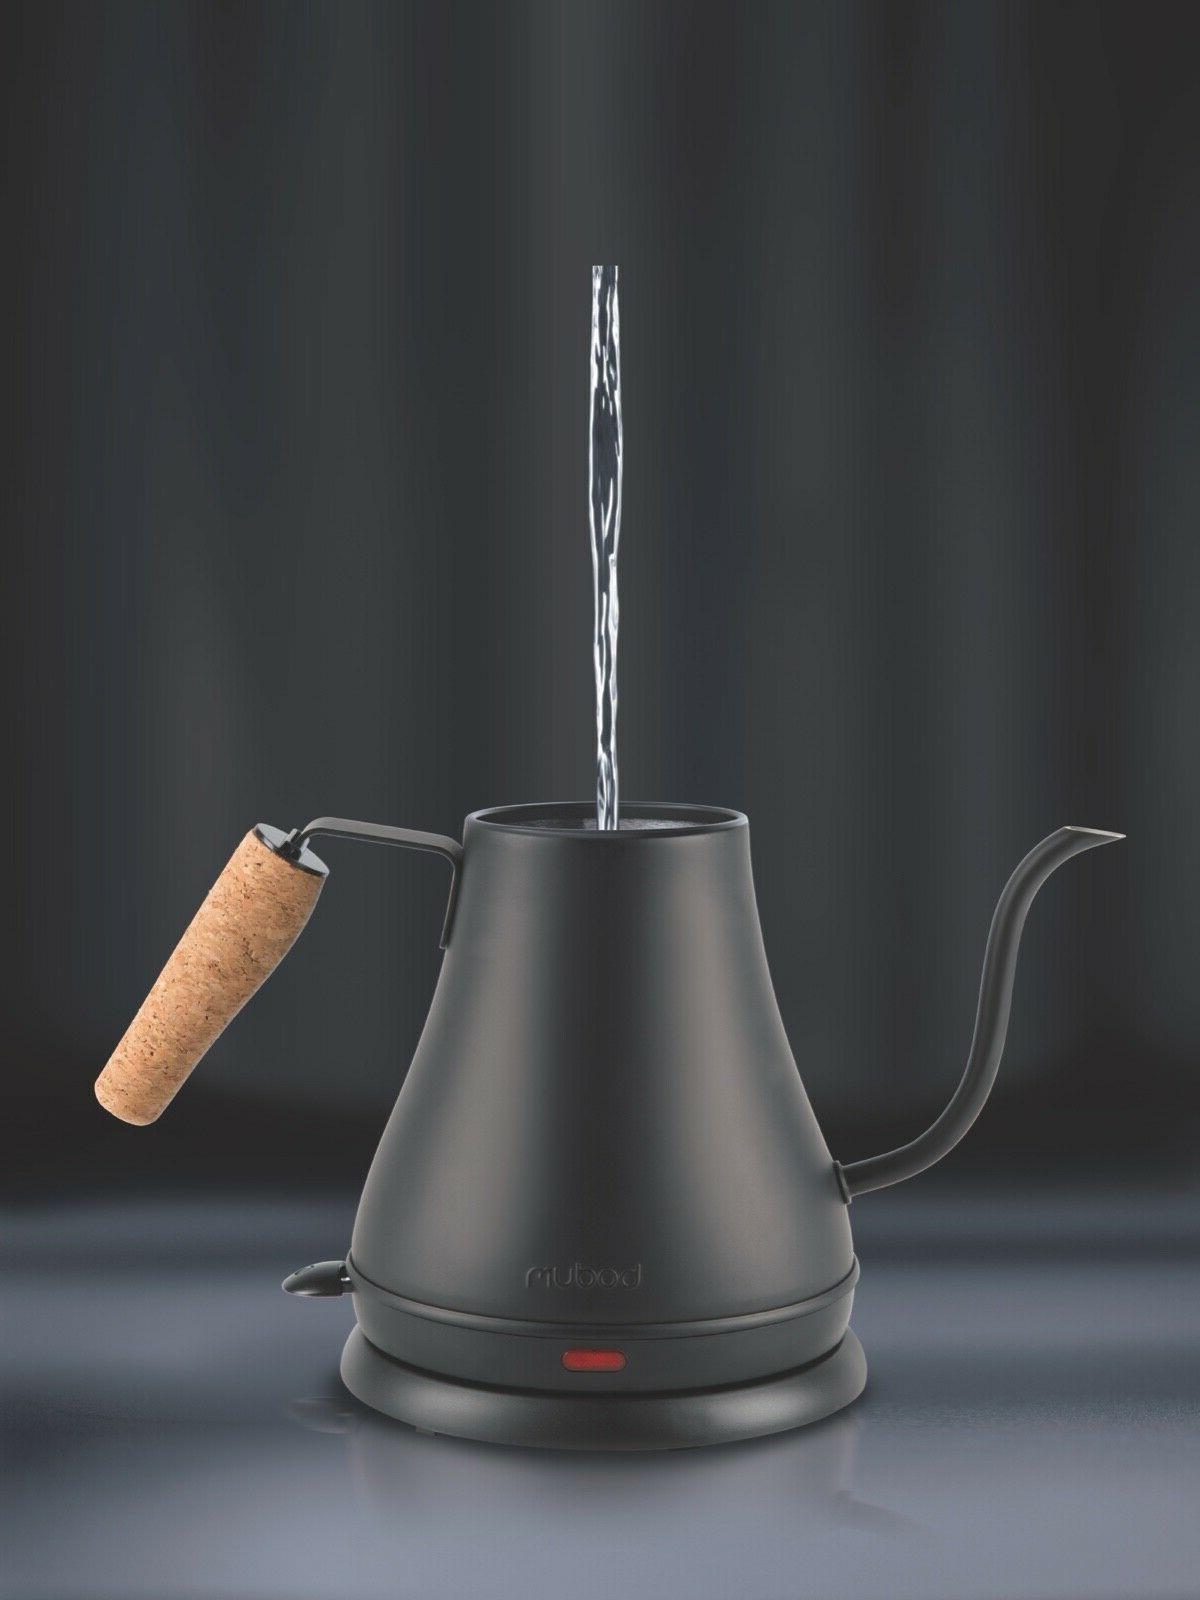 BODUM Electric Water Kettle Black Handle 27oz